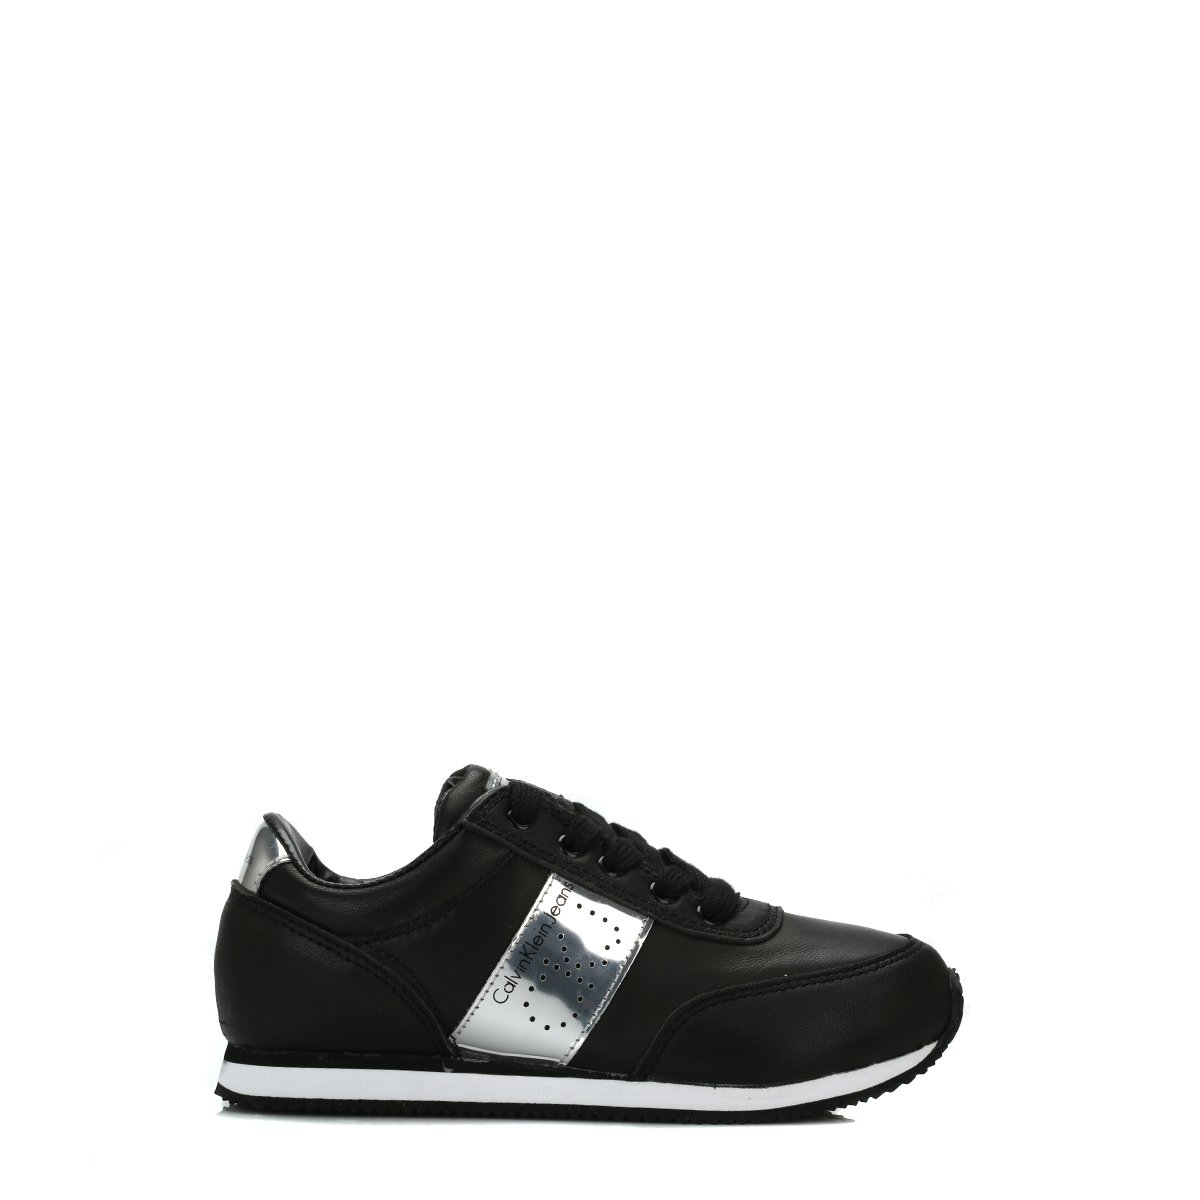 Calvin Klein Jeans Kids Black \u0026 Silver